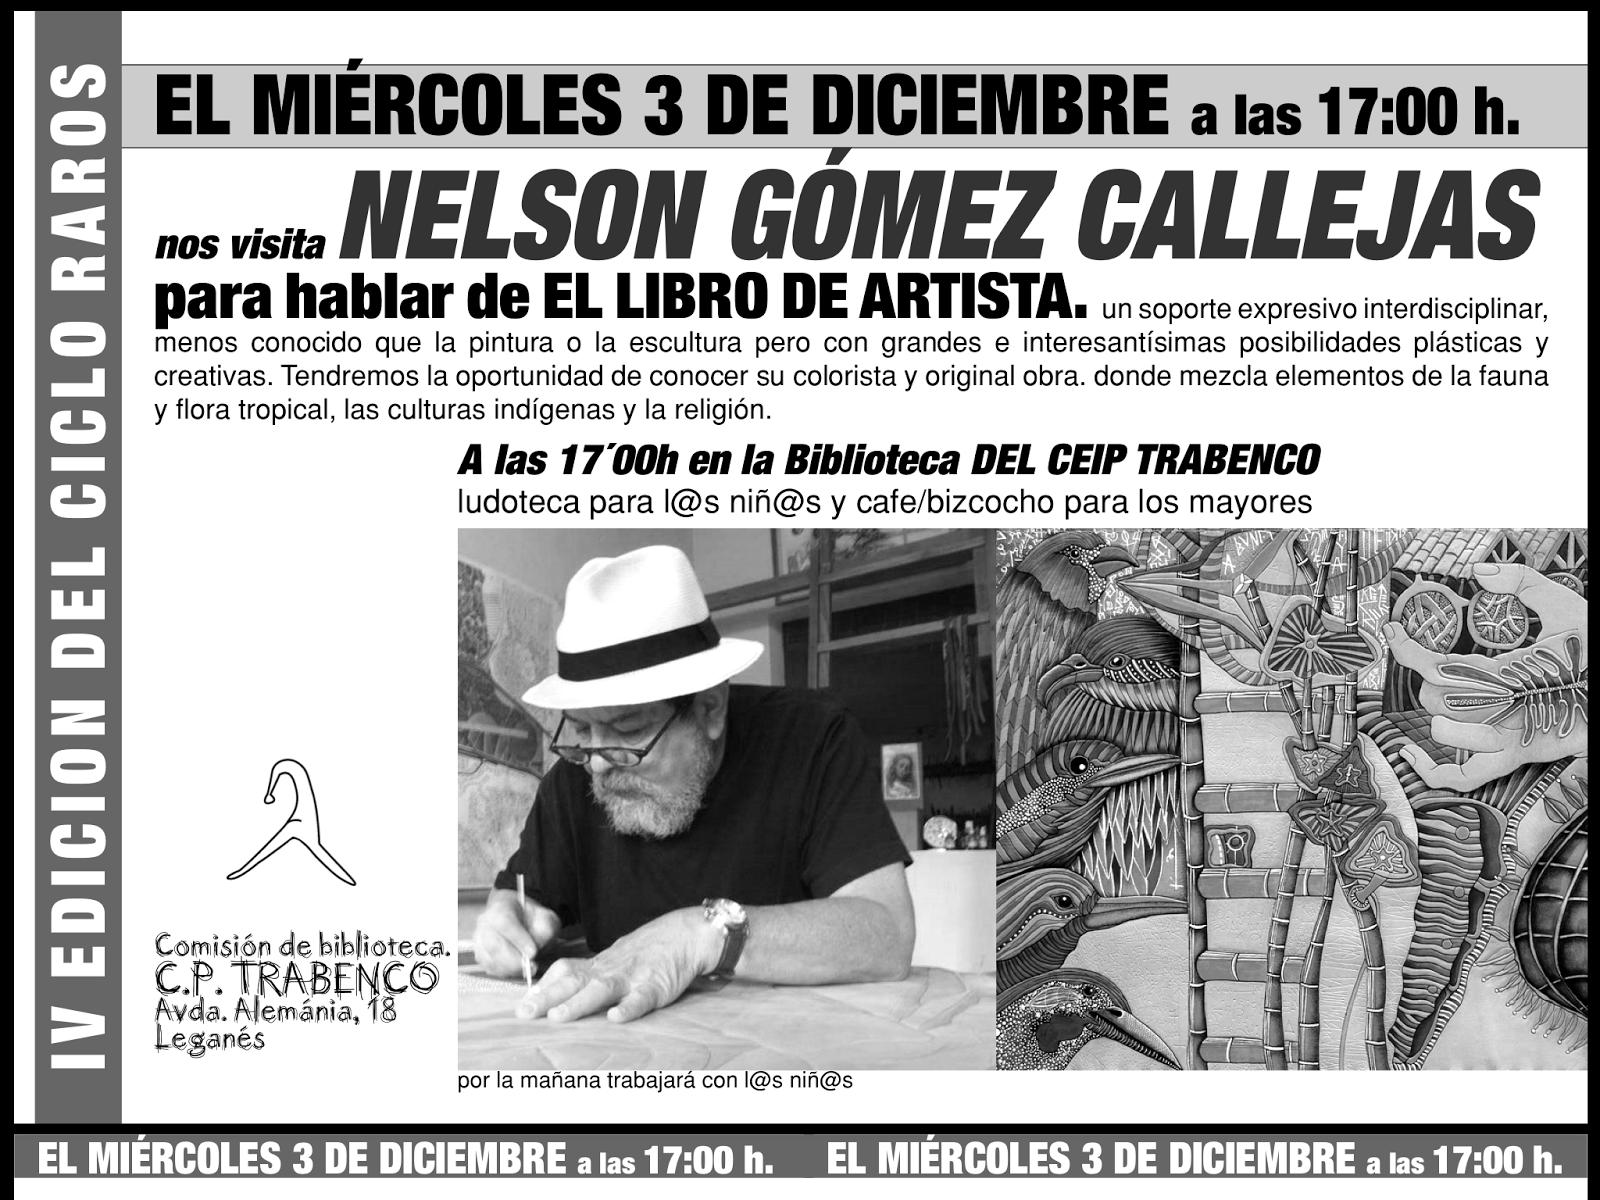 Nelson Gómez Callejas